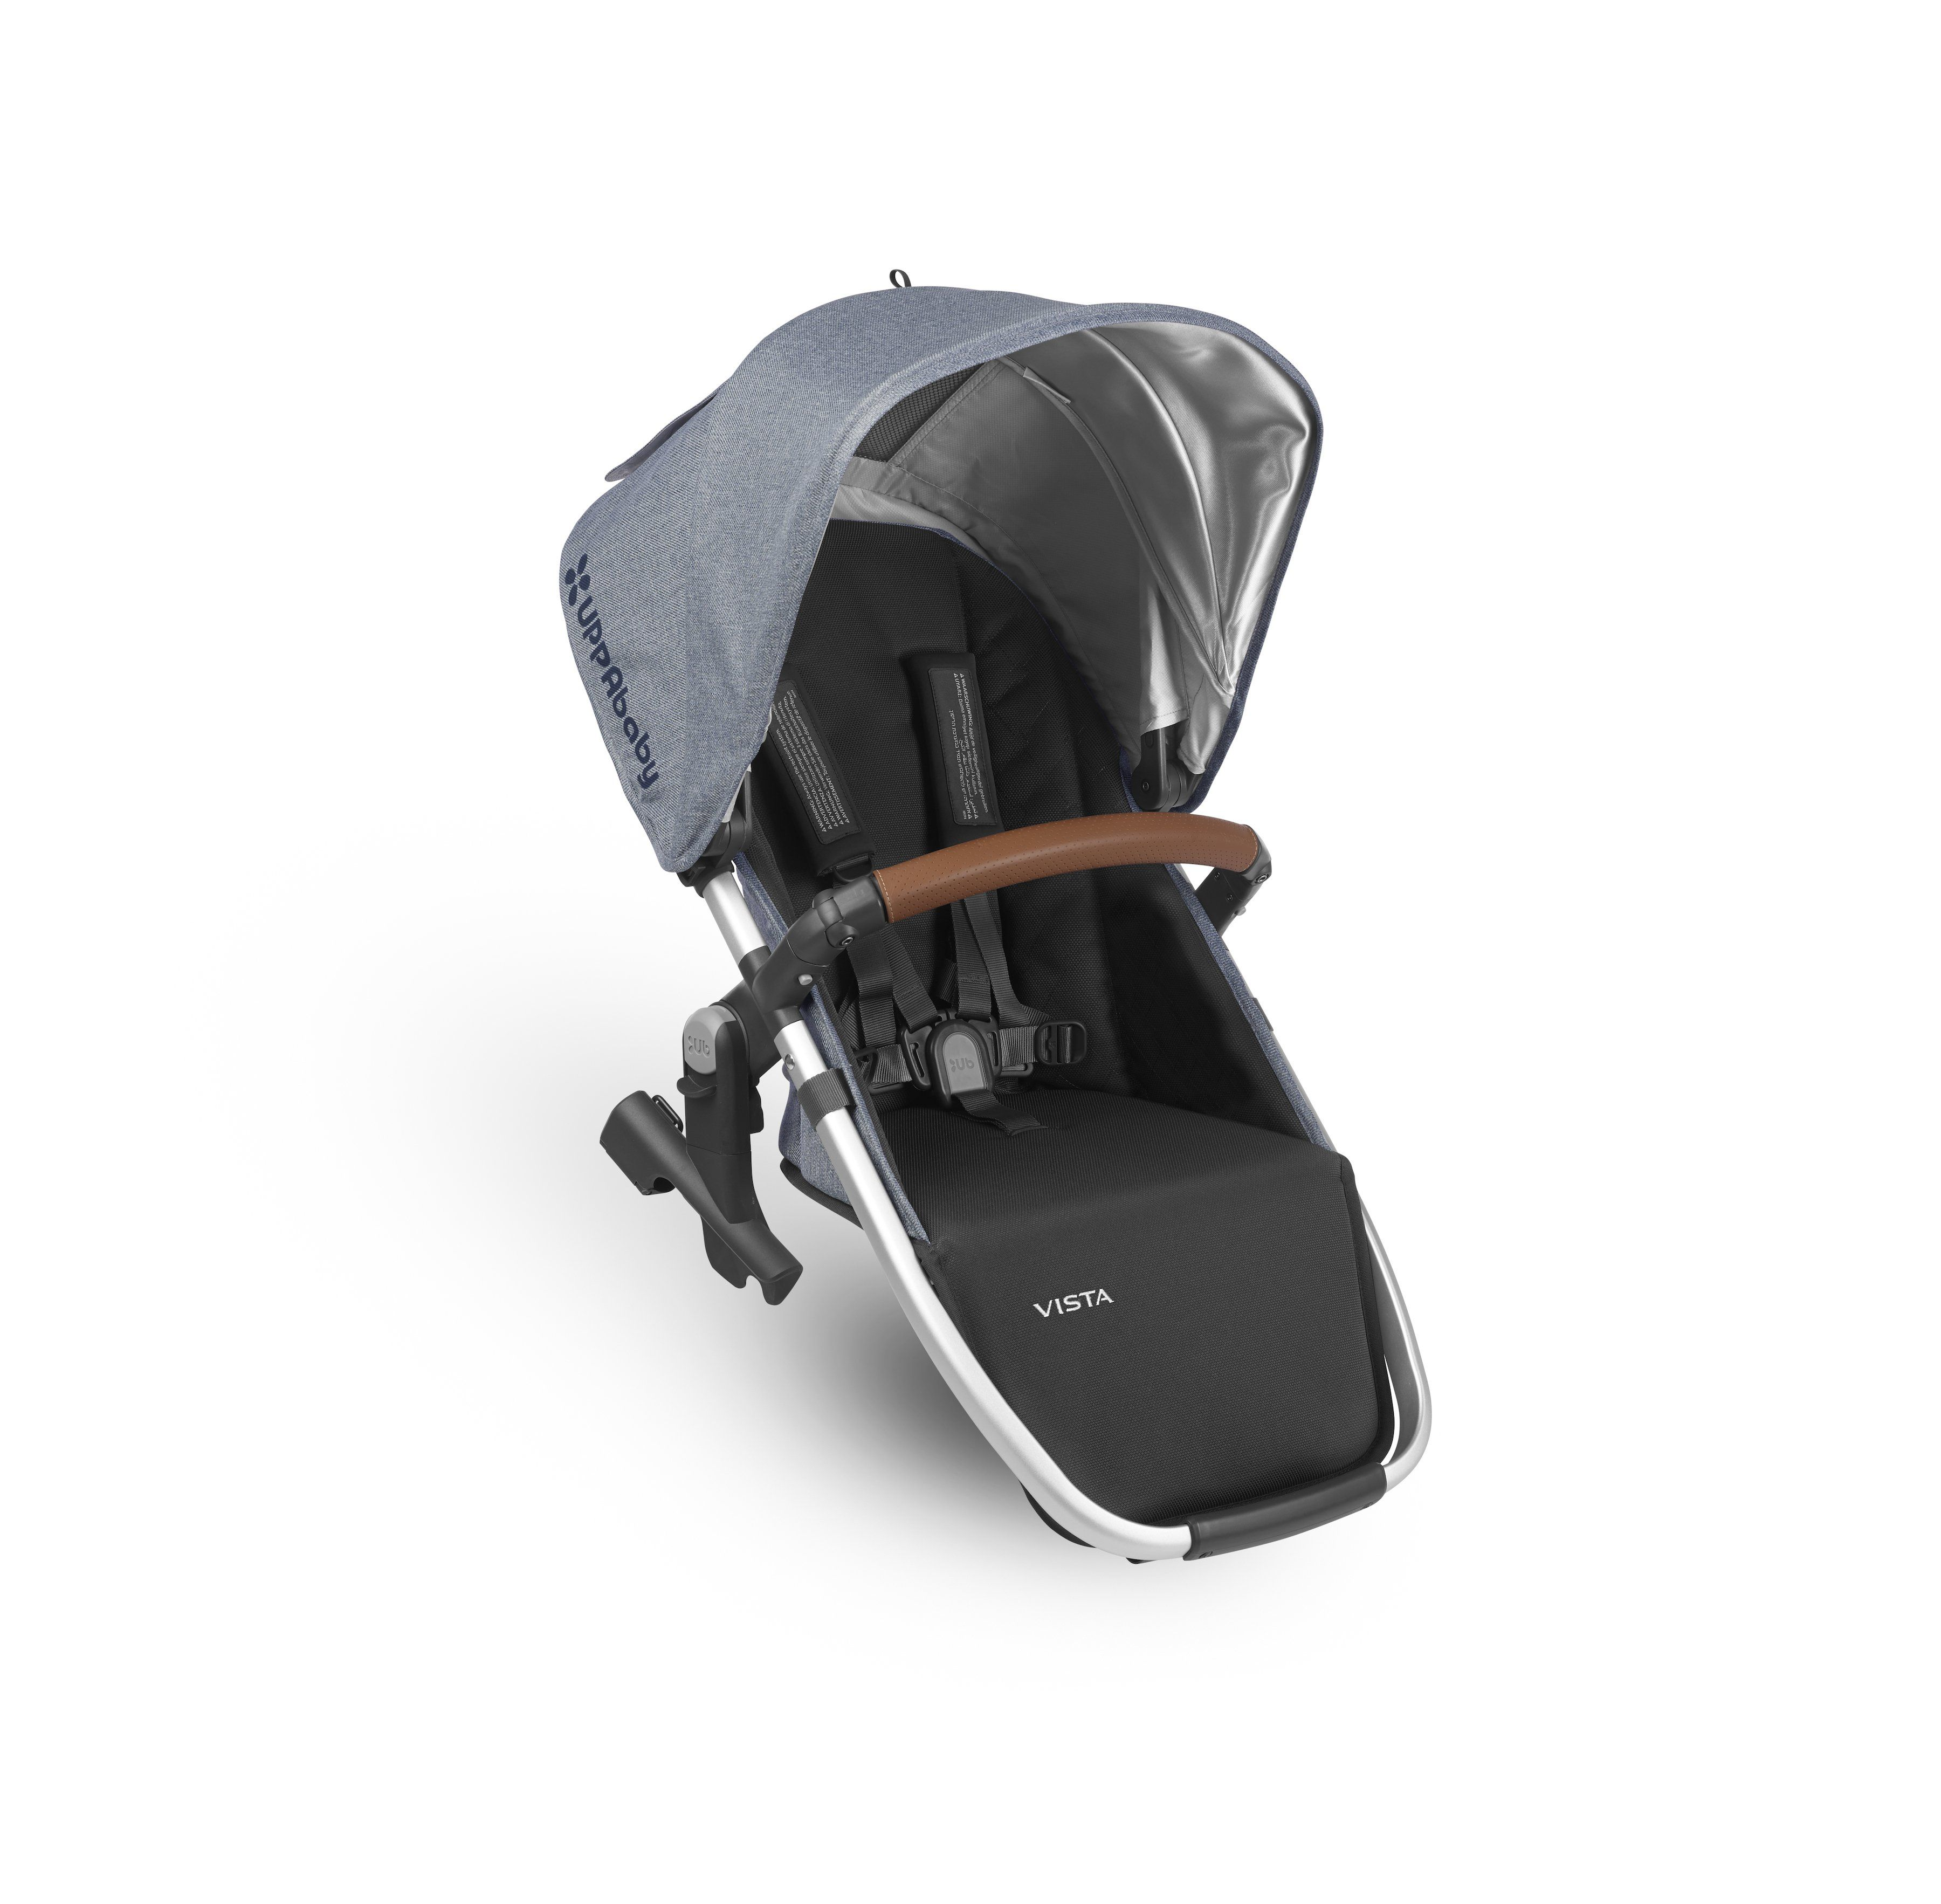 2019 UPPAbaby Vista Rumbleseat Vista stroller, Uppababy